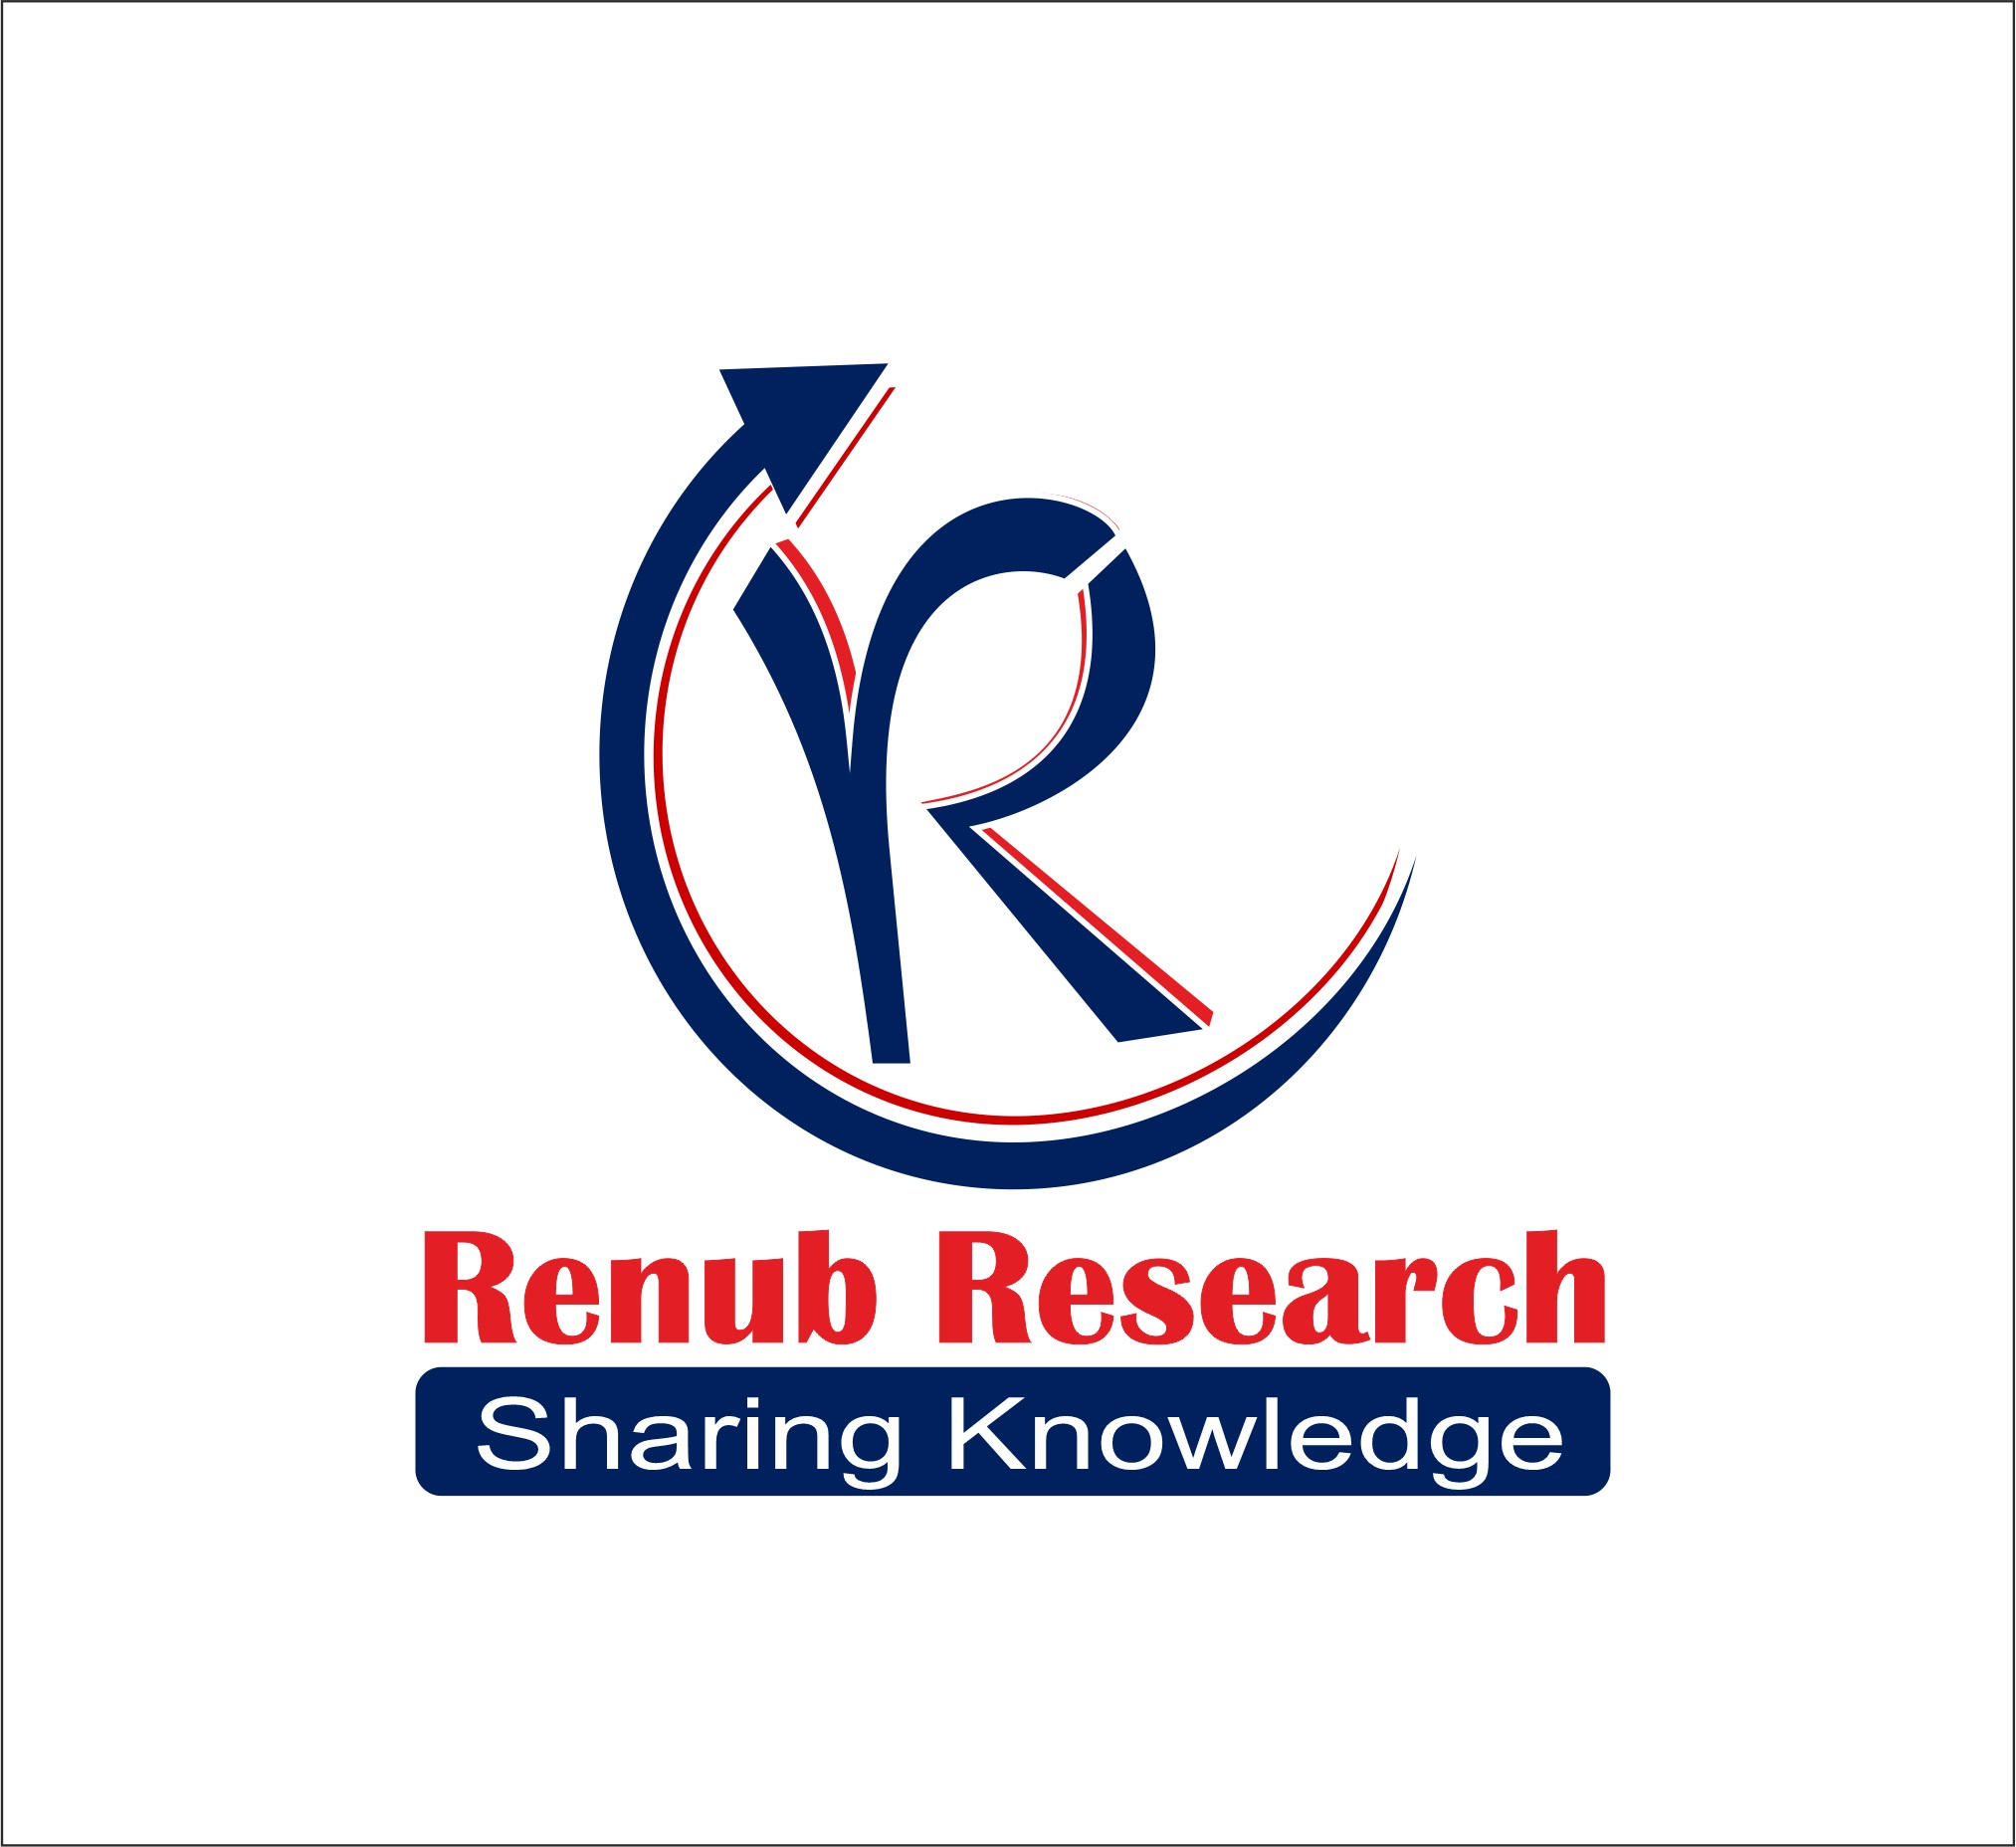 Global Online Education Market will be US$ 350 Billion by 2025 - Renub Research